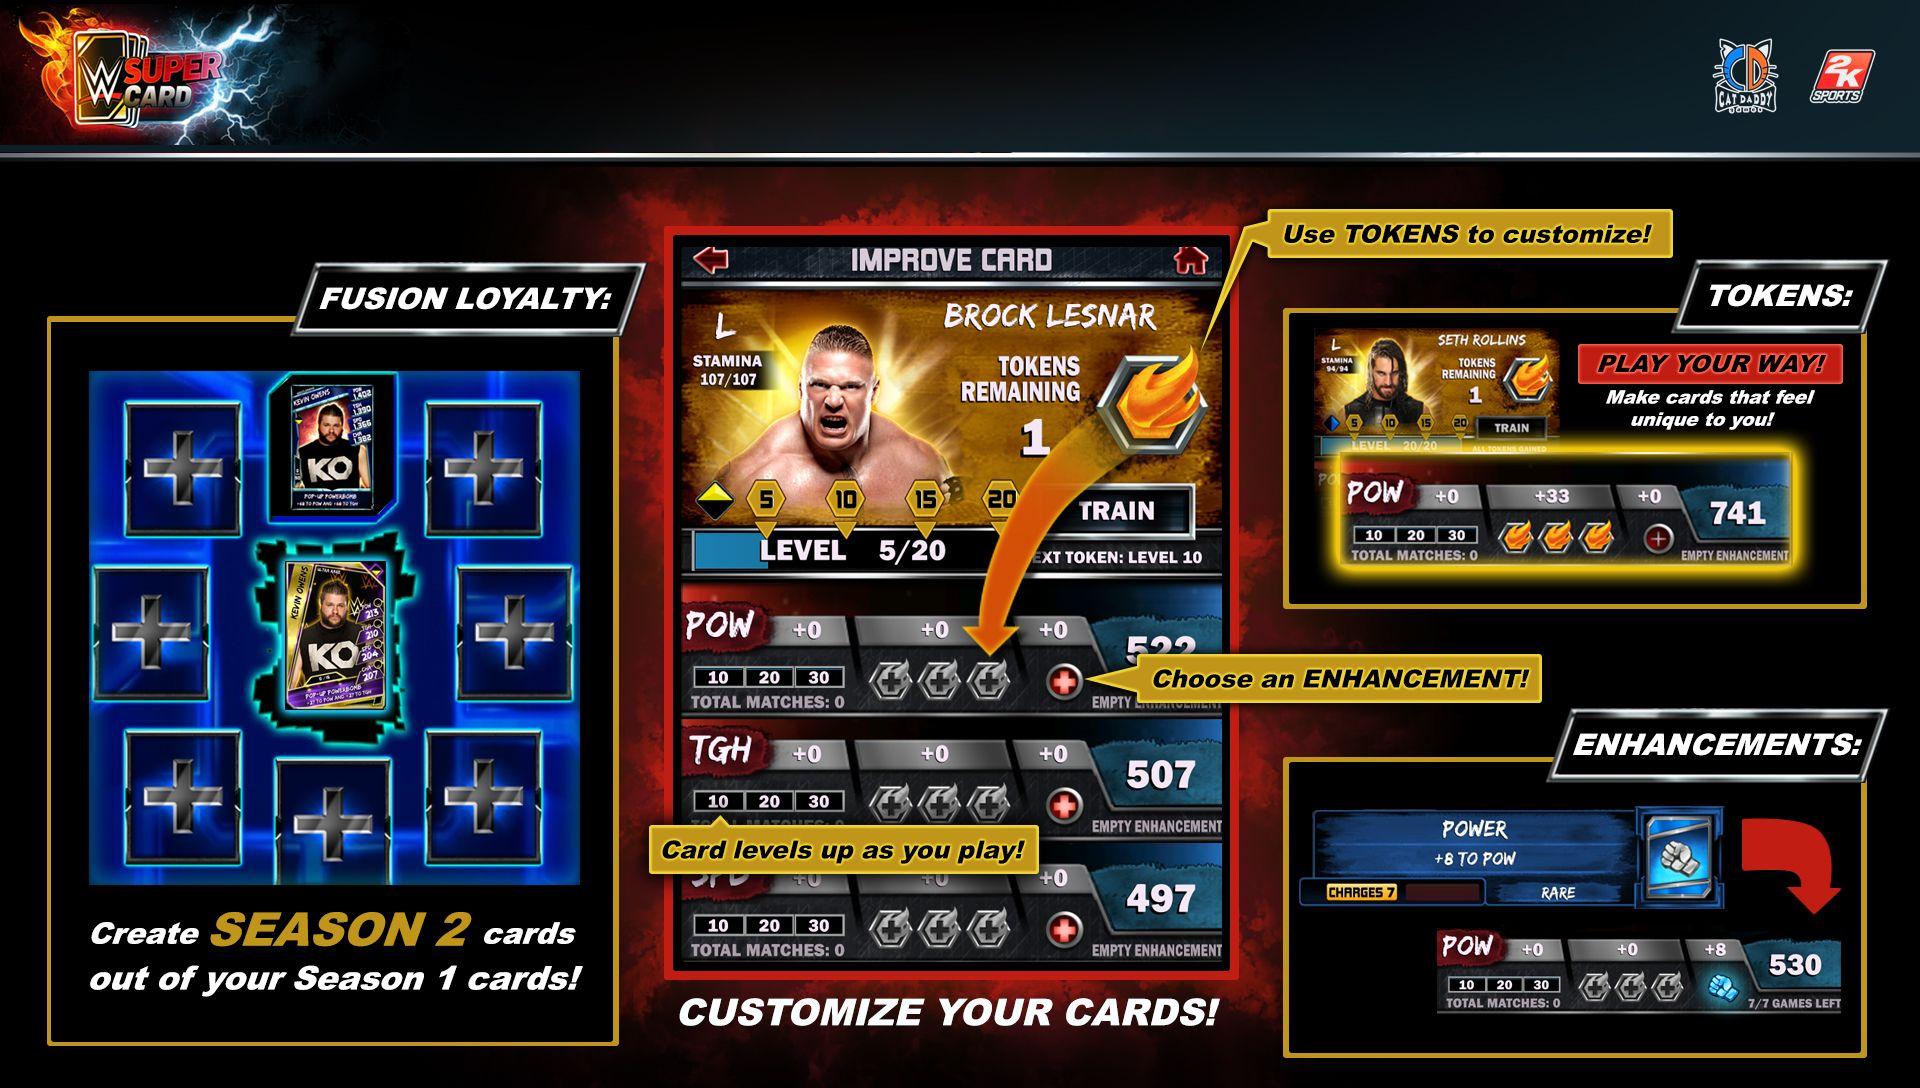 Introducing Season 2 of WWE SuperCard